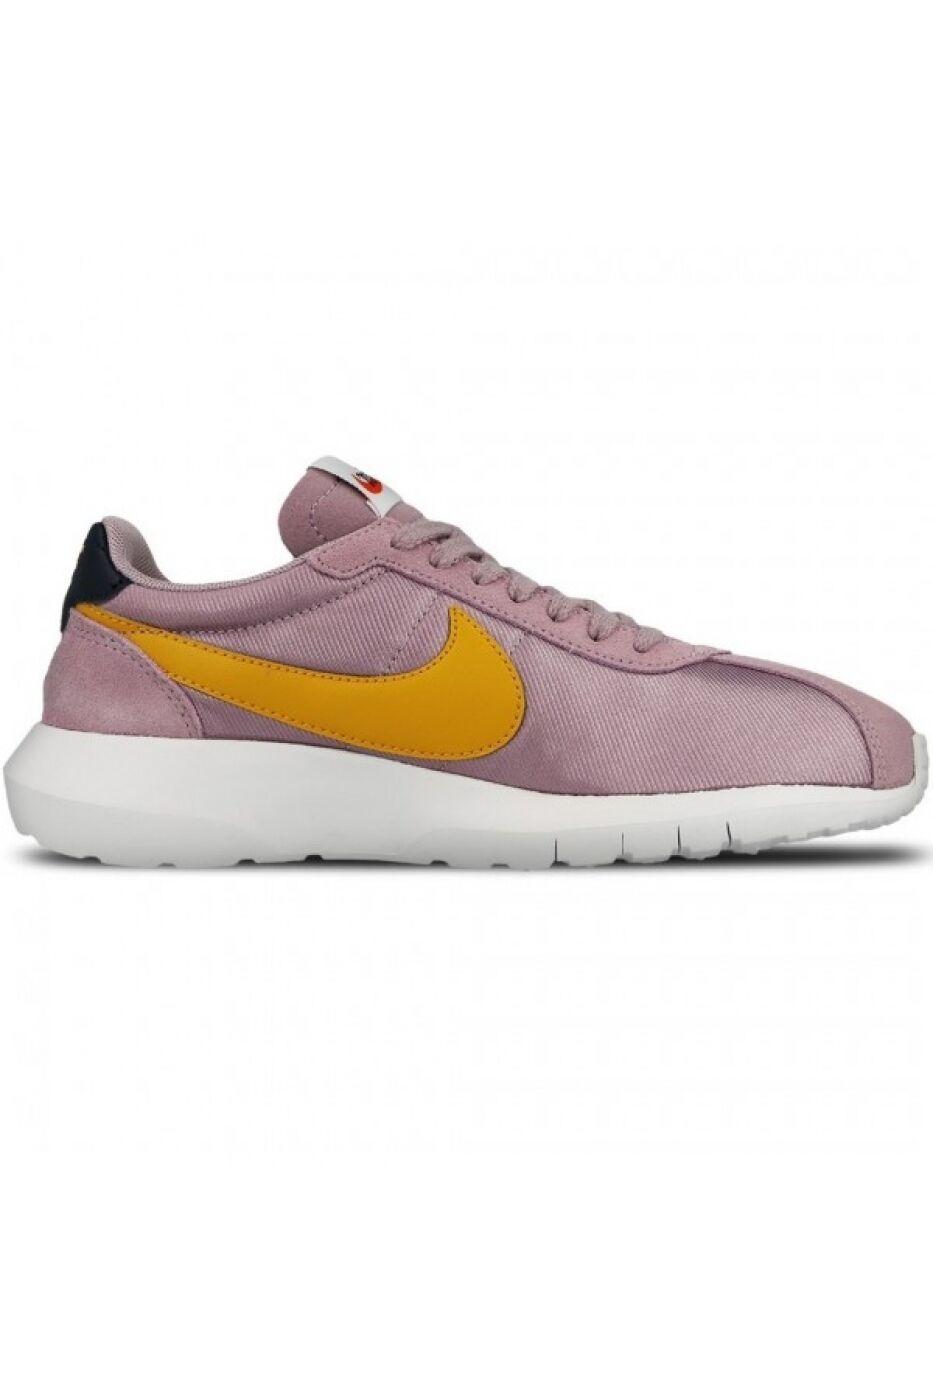 Nike Wmns roshe Unido LD-1000 Ciruela Niebla/Hoja De Oro-Blanco Reino Unido roshe 6.5 3d25ea